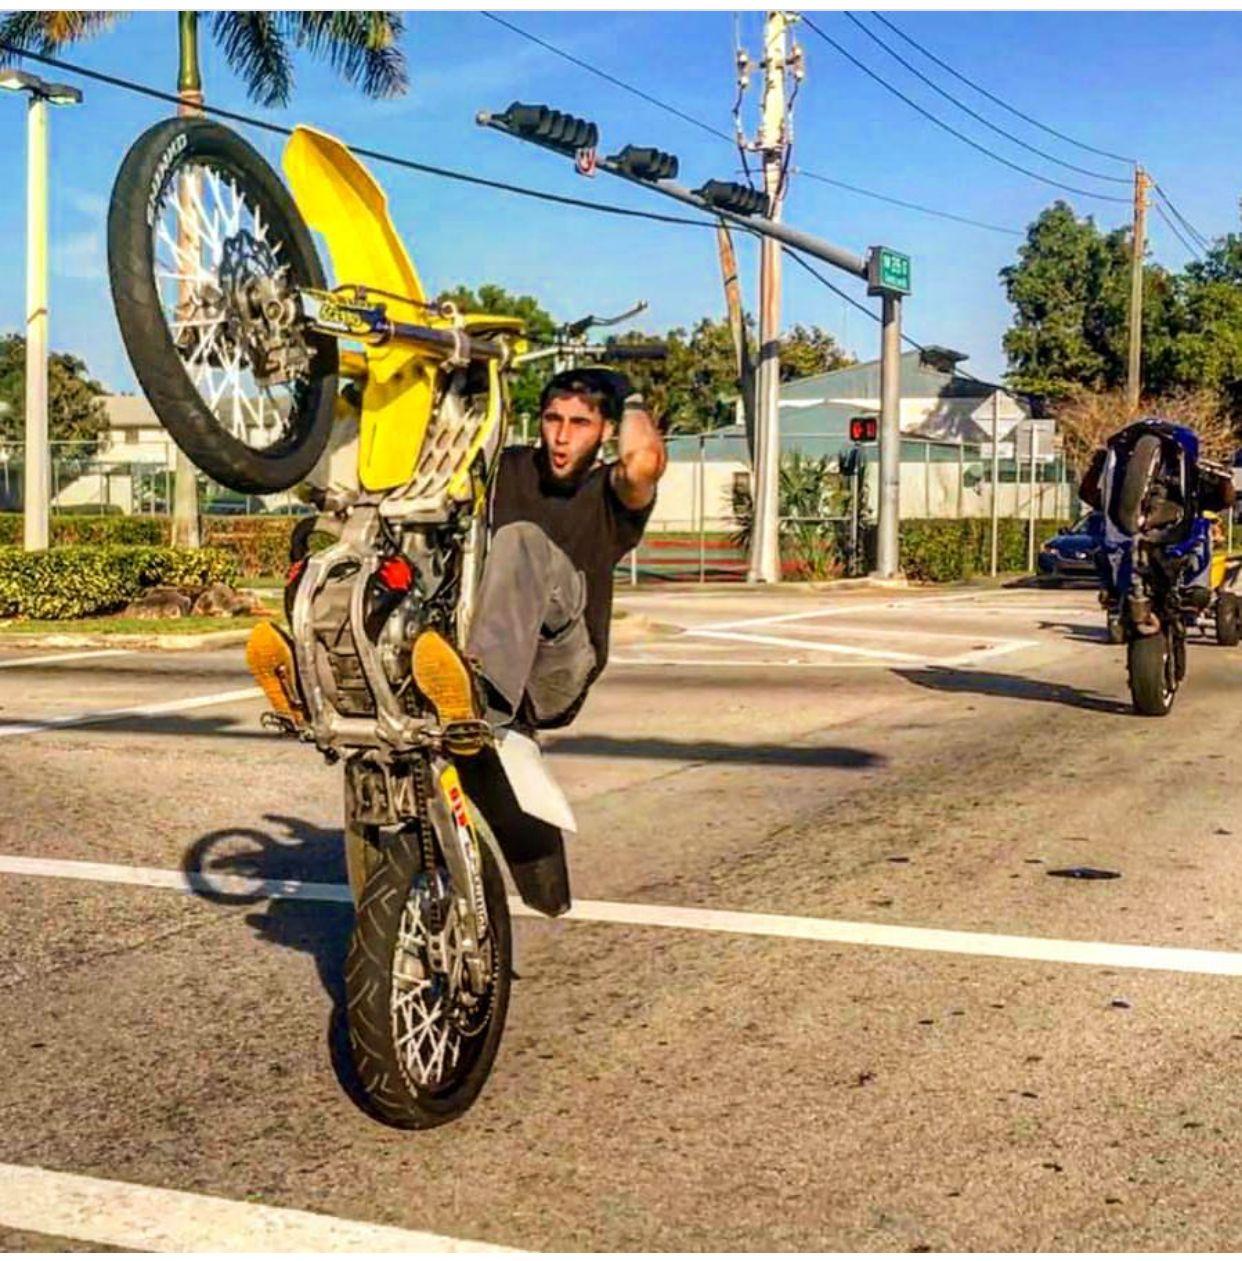 Pin By Jeff Sawyer On Stunt Life Bike Life Moto Bike Supermoto